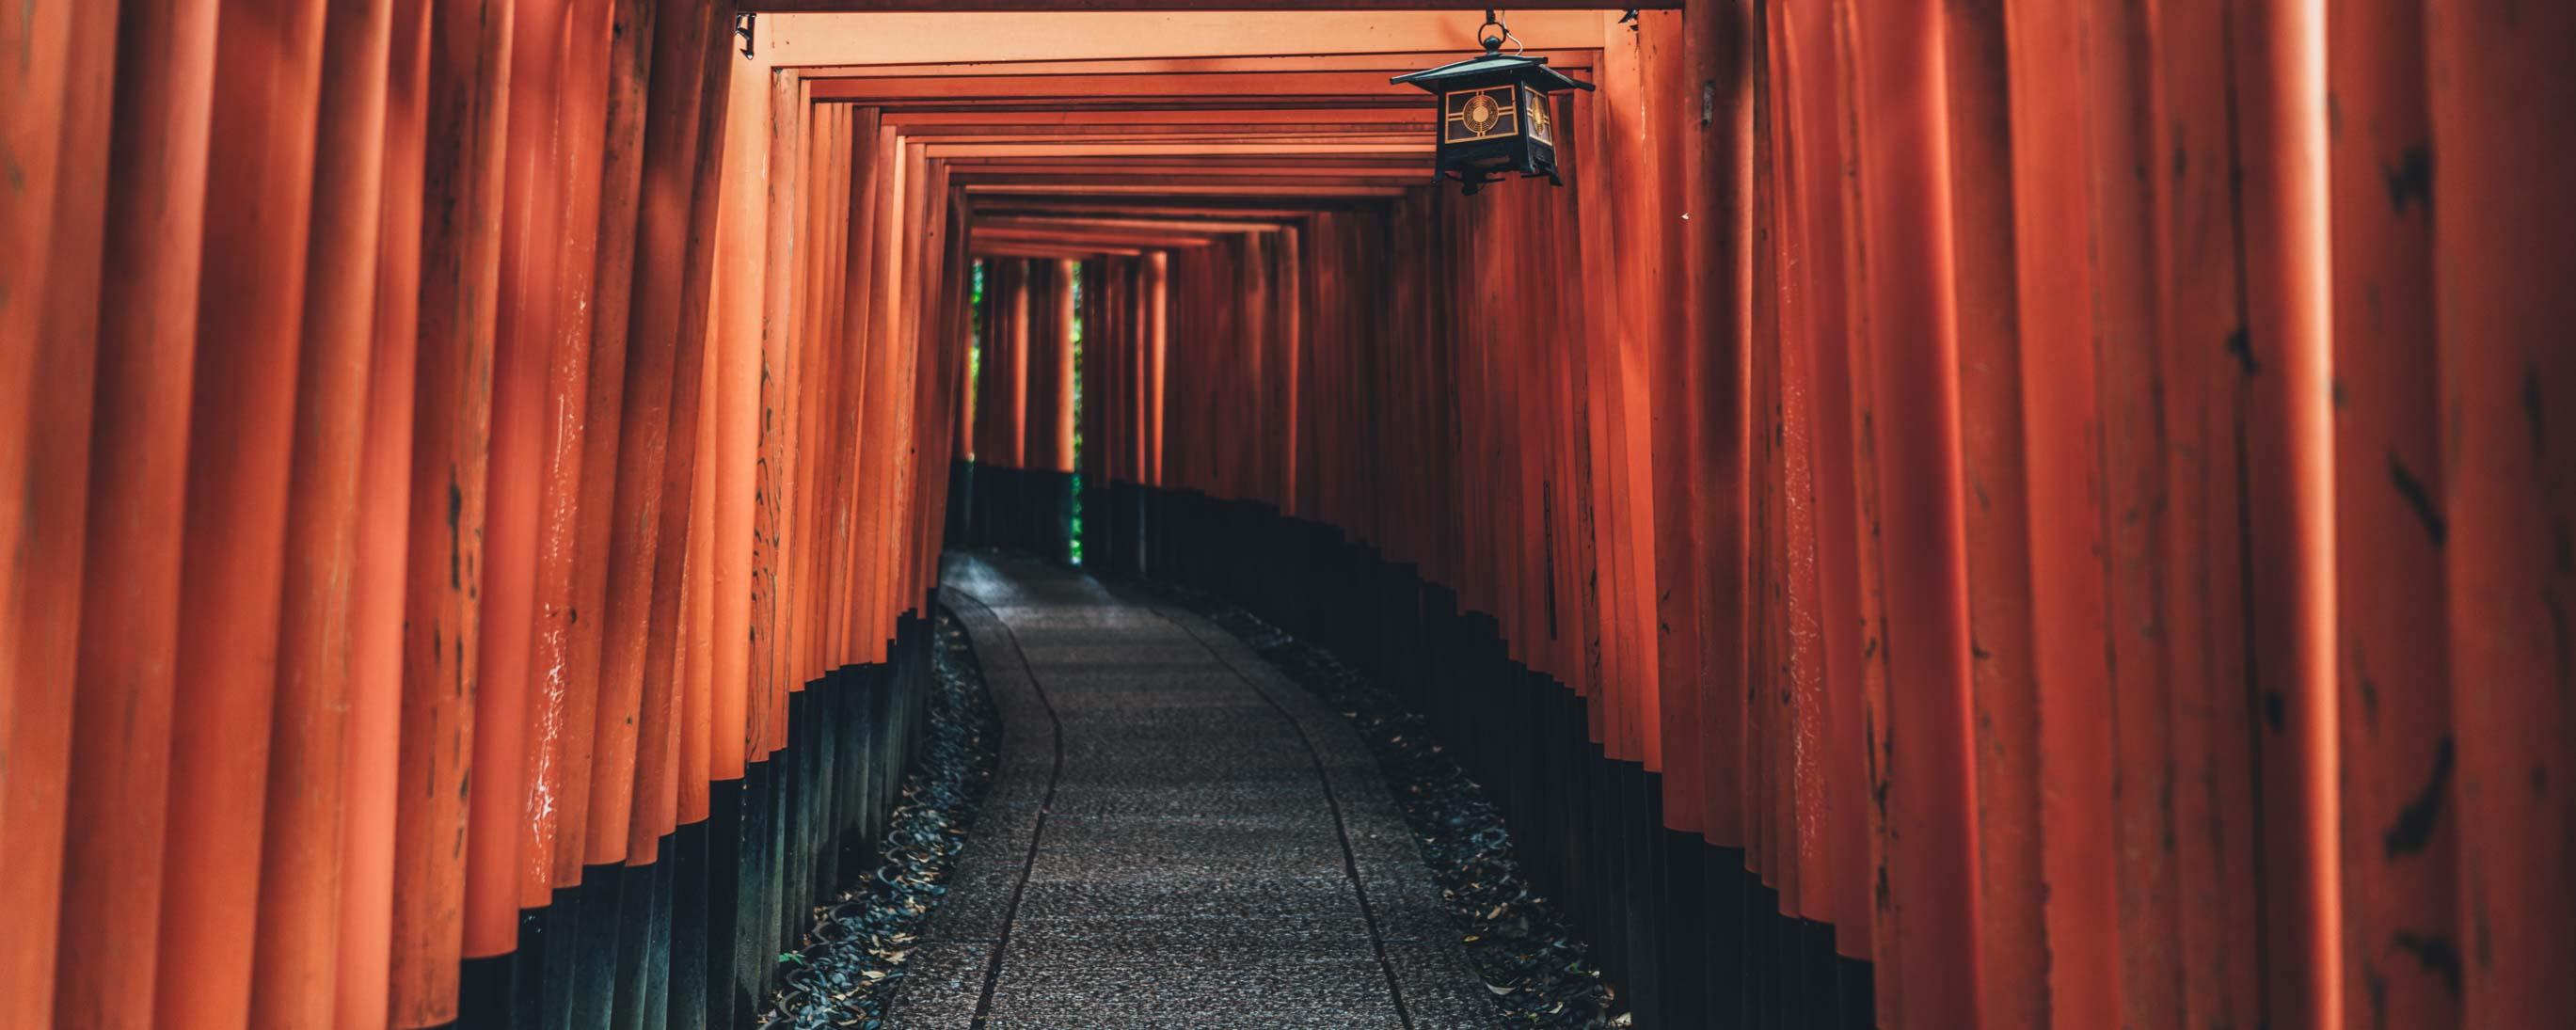 Fushimi Inari Taisha Torii Kyoto Japan 2